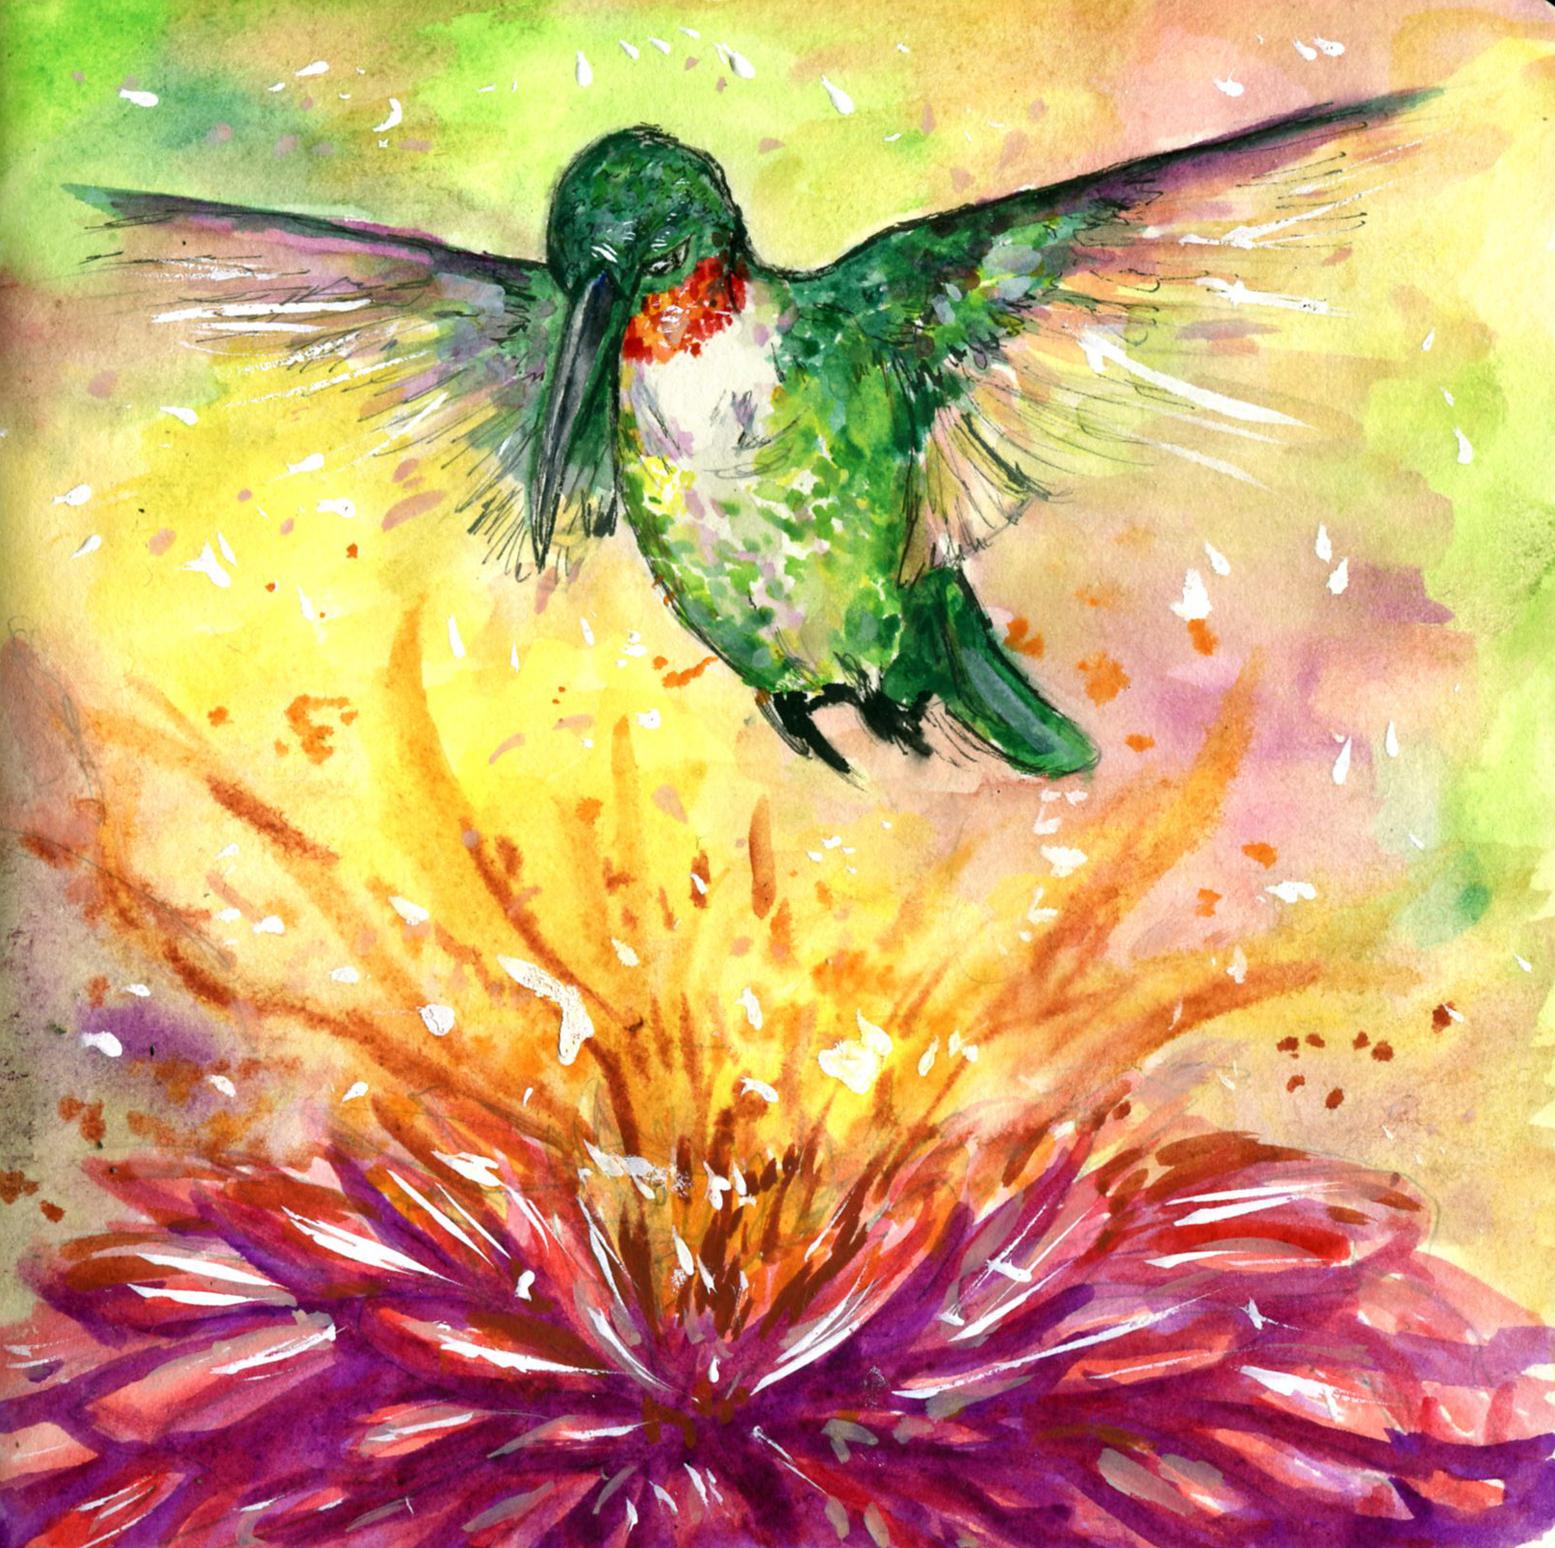 51. Ruby-throated Hummingbird